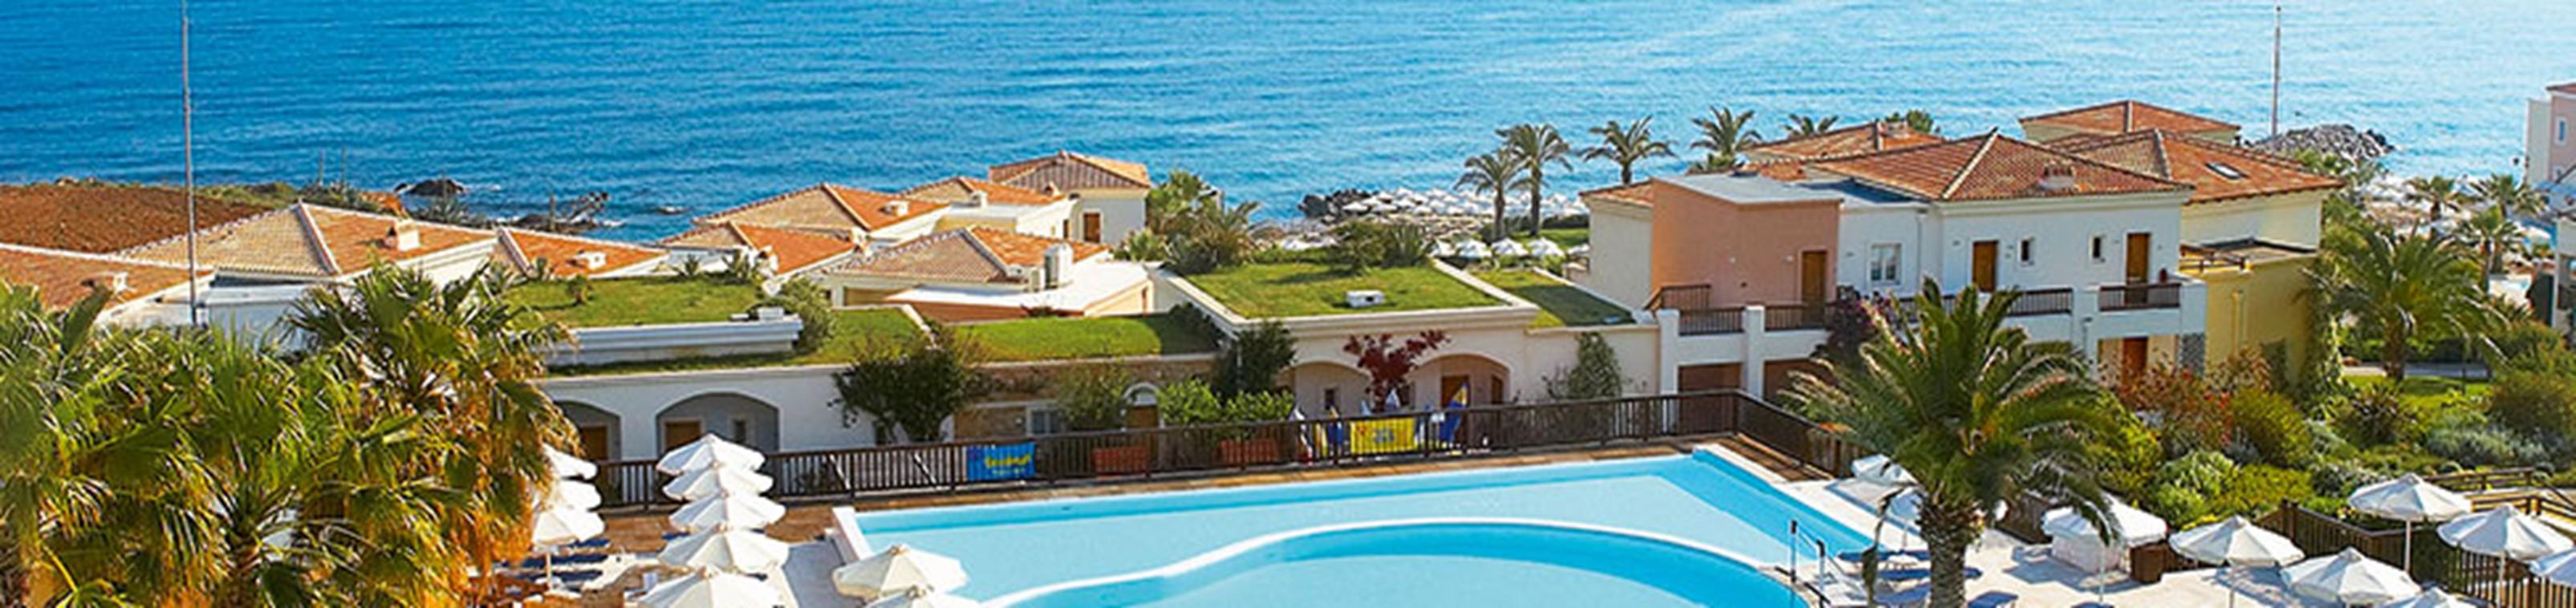 All inclusive familiehotel in Griekenland